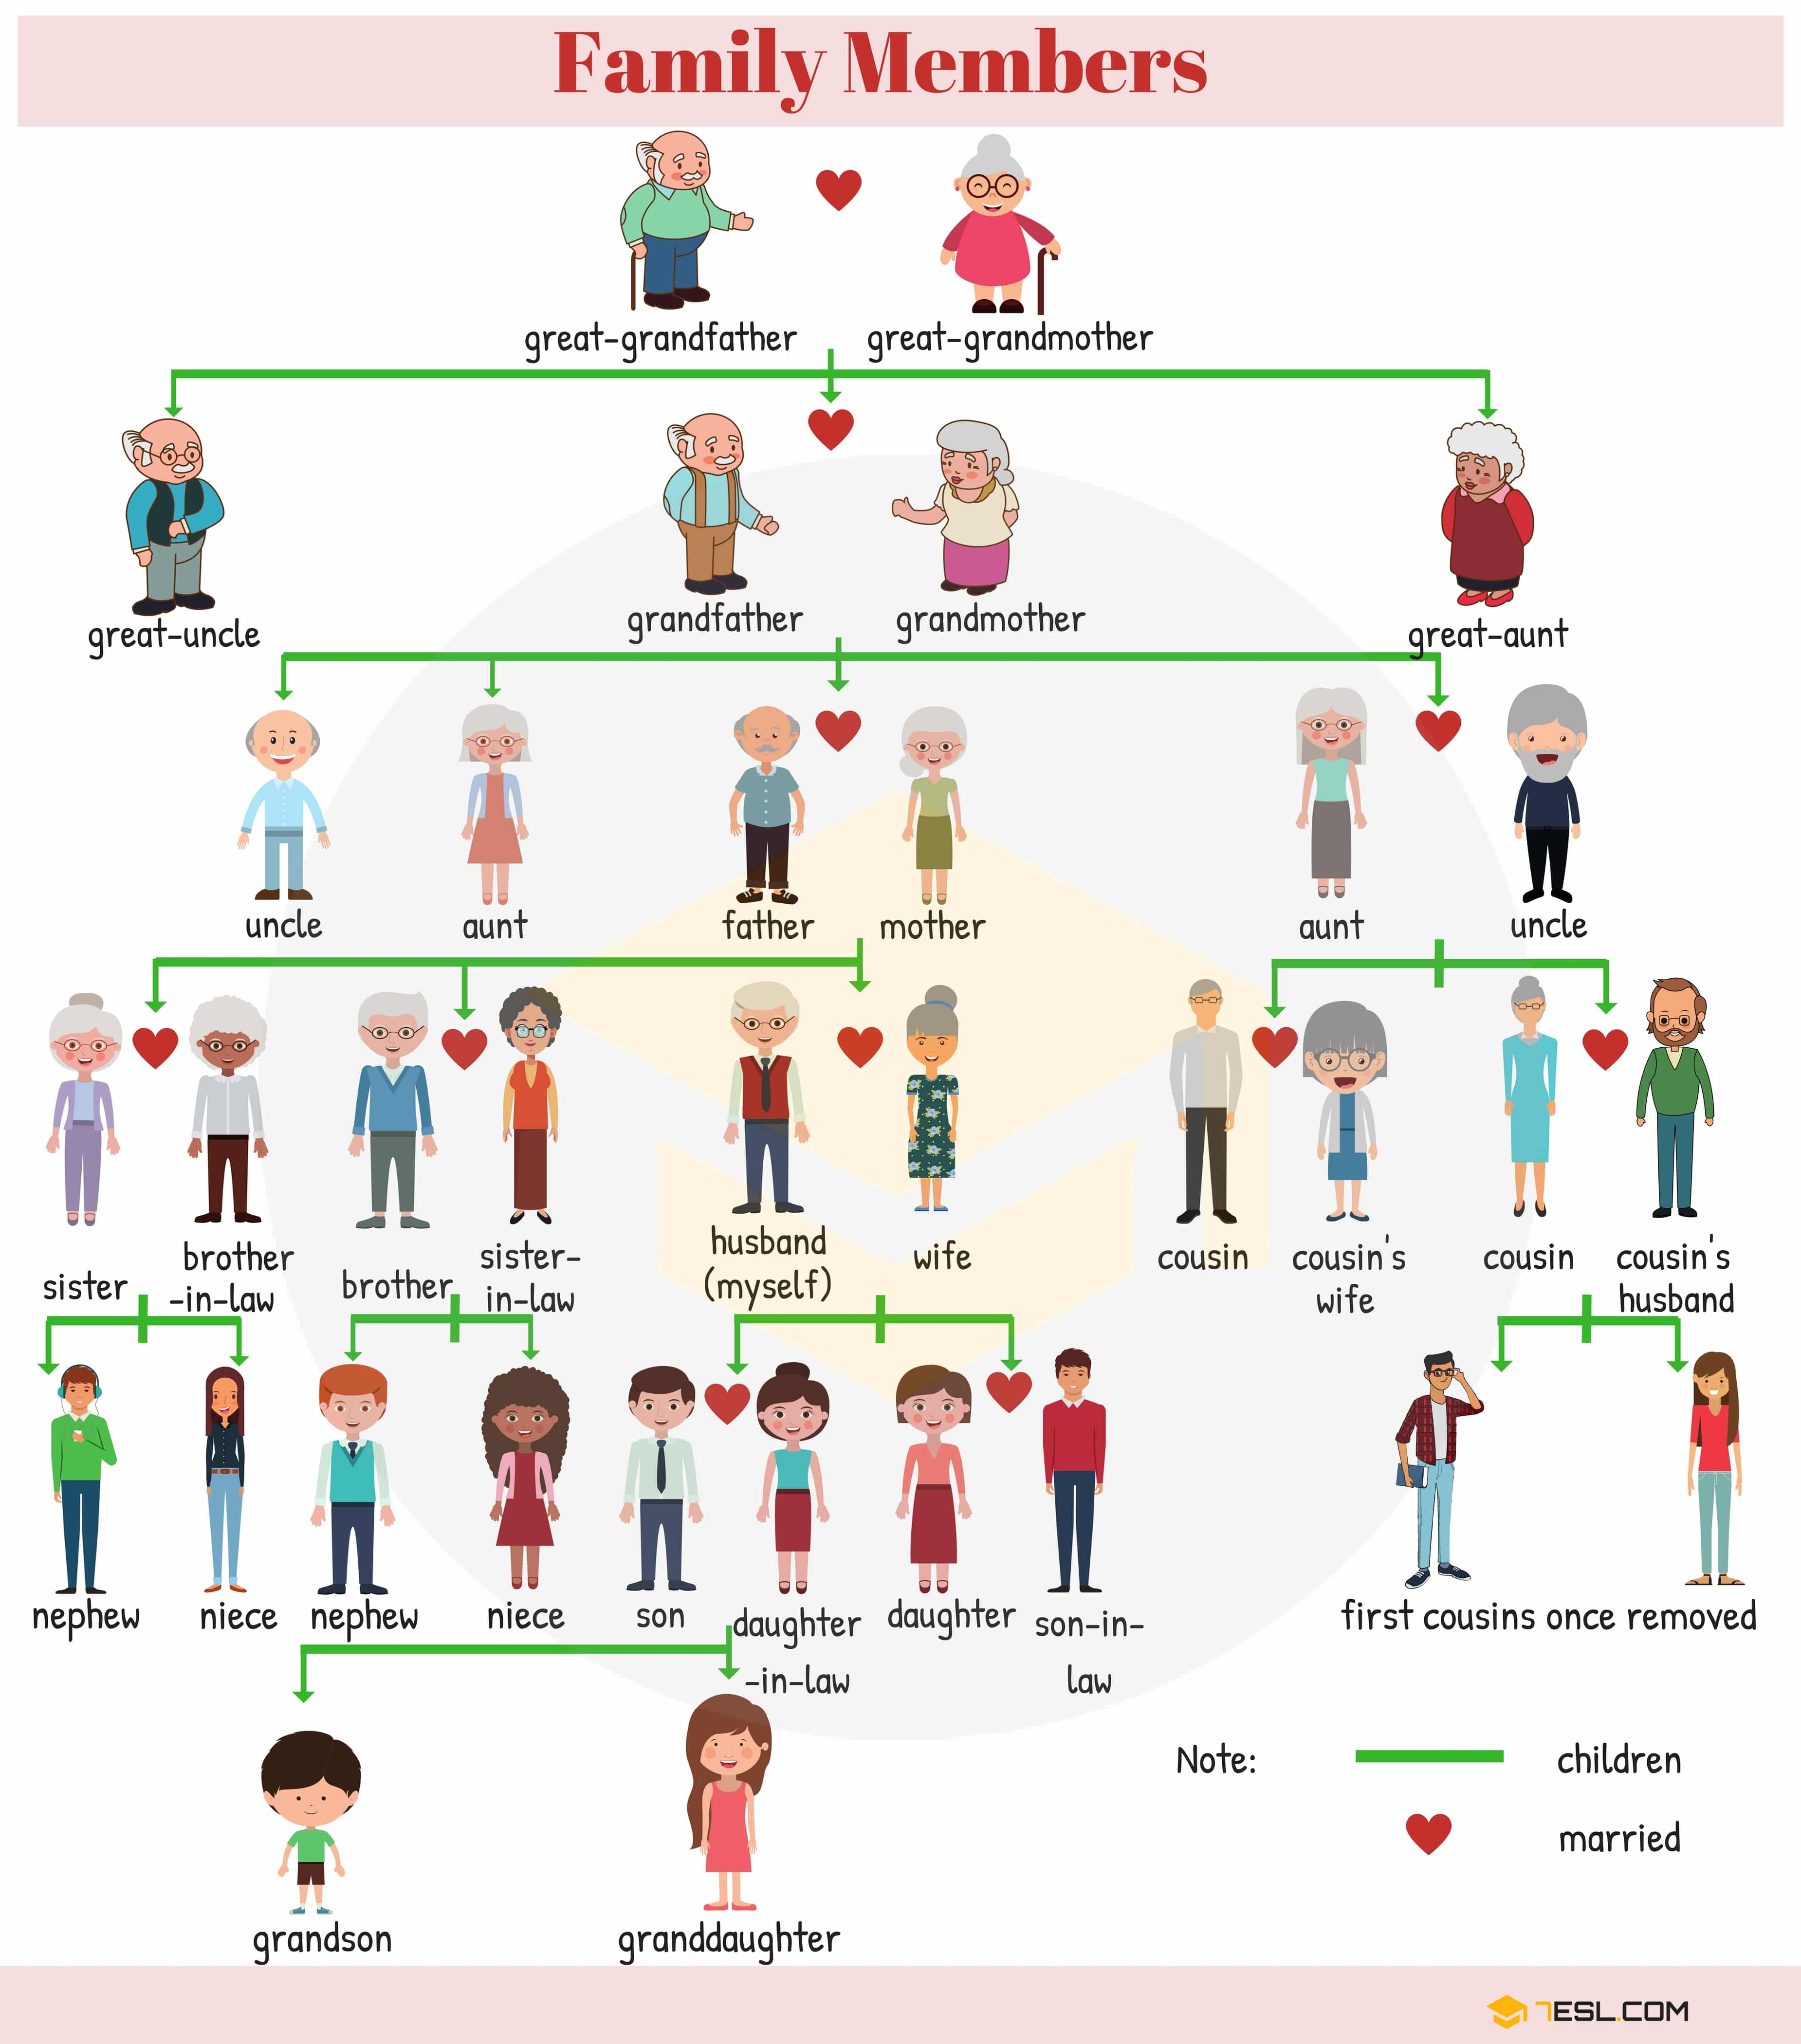 Members of the Family Vocabulary | Family Members Tree - 7 E S L